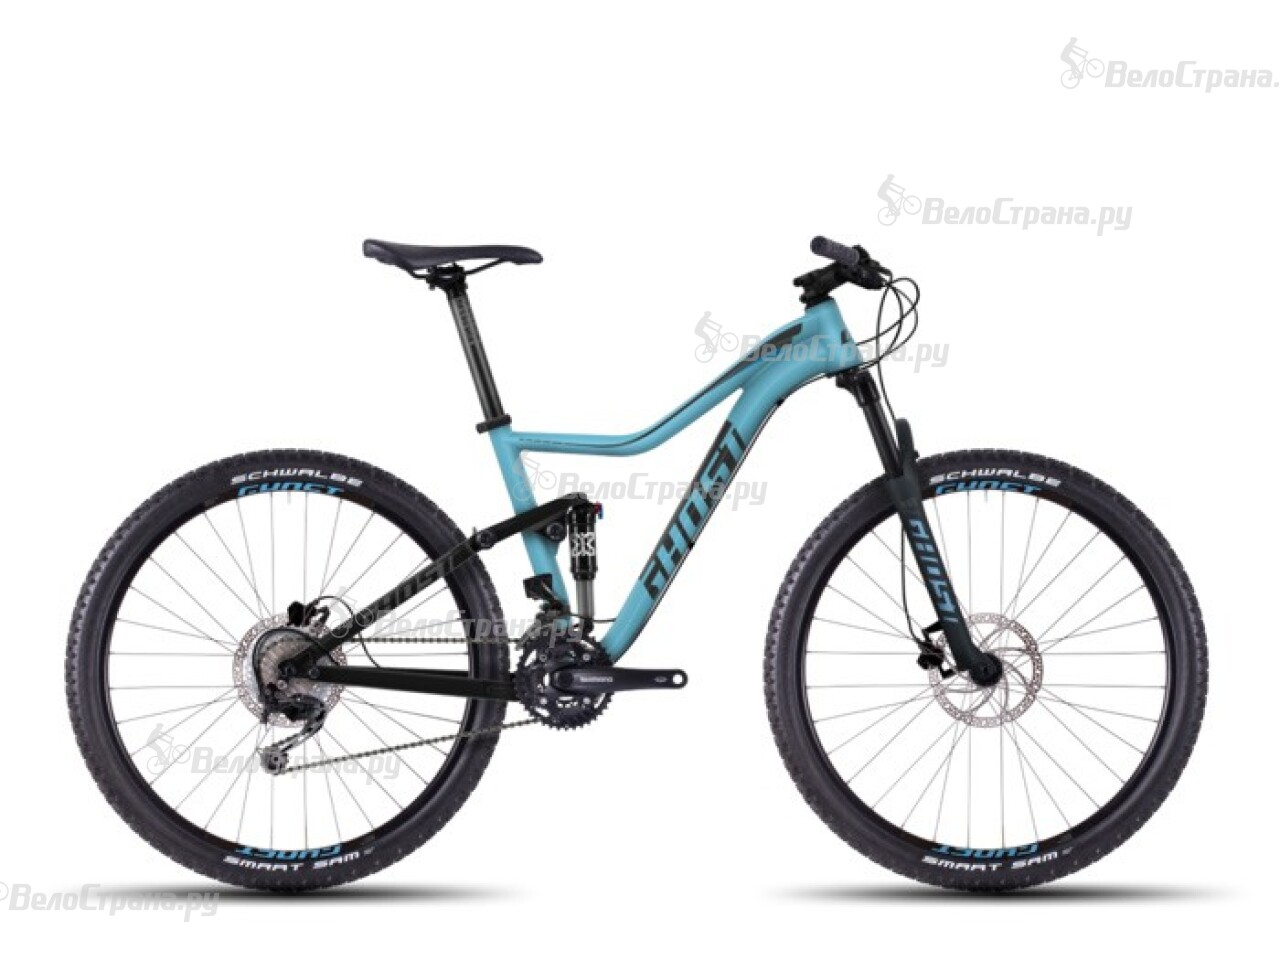 Велосипед Ghost Lanao FS 2 (2016) ahoy ghost ship ahead 2